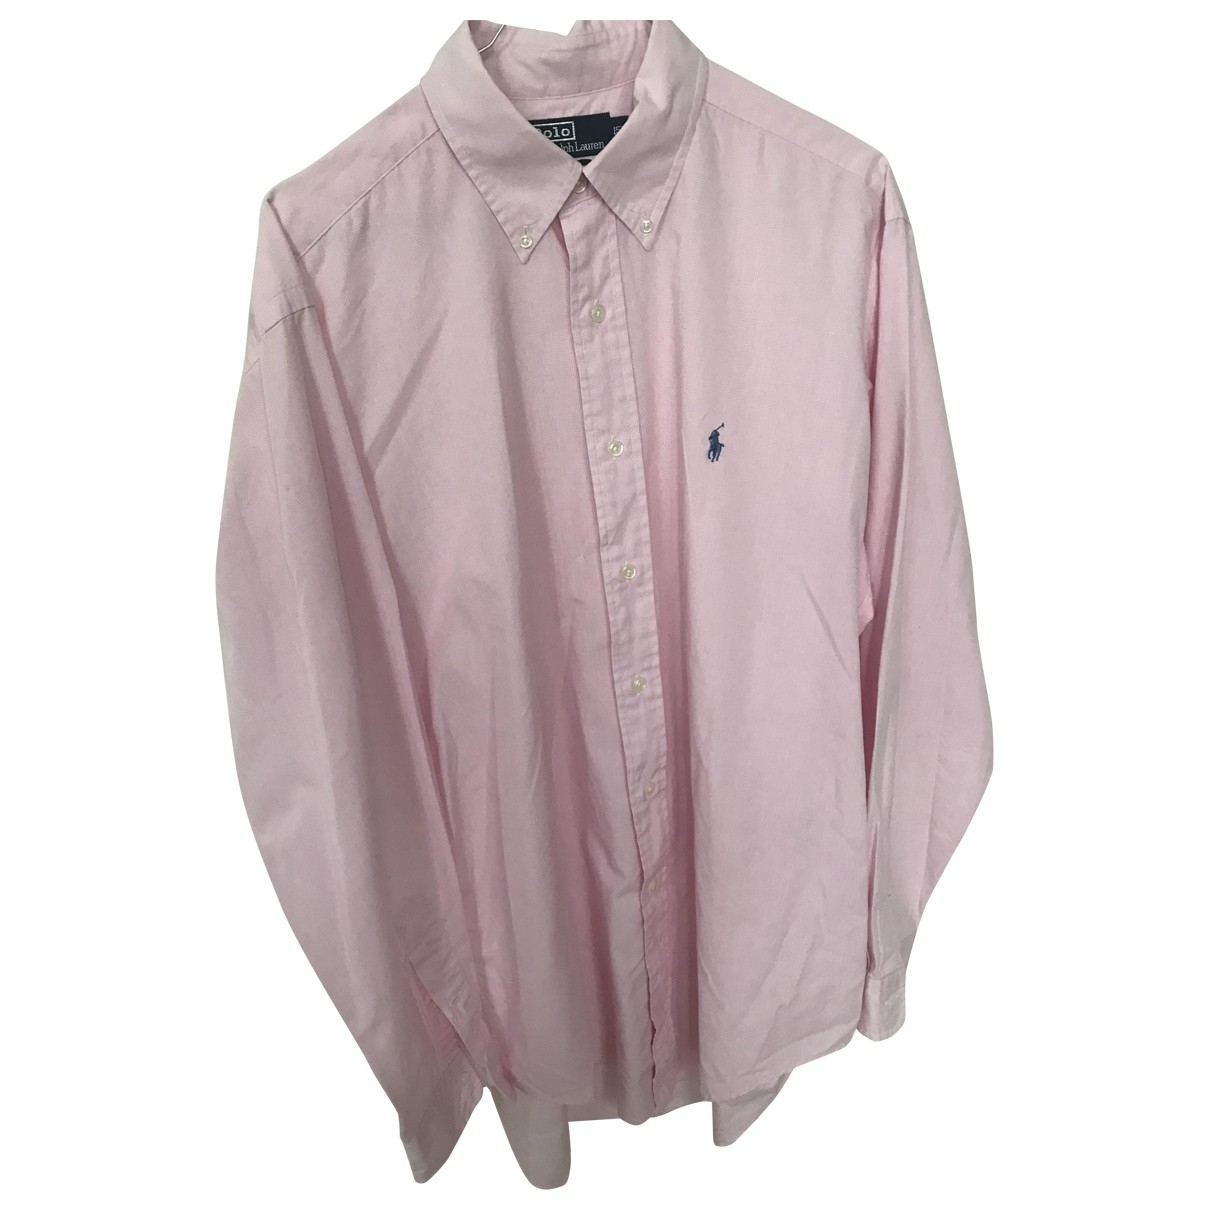 Polo Ralph Lauren \N Pink Cotton Shirts for Men 15.5 UK - US (tour de cou / collar)